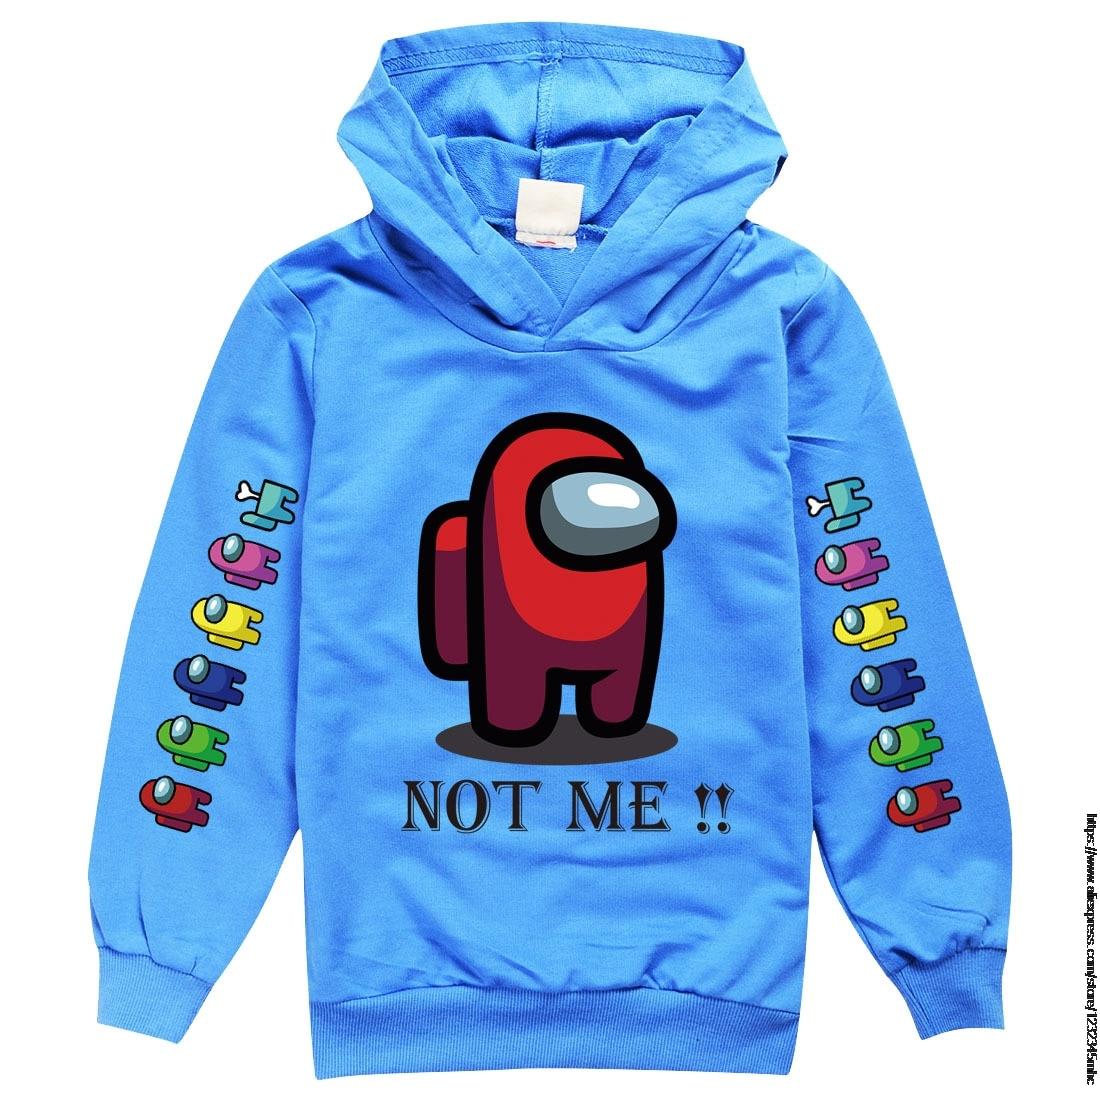 autumn fashion Hoodie hot game Among Us boys dress as Sweatshirt girls Sweatshirt winter warm 3D printed top children's clothes